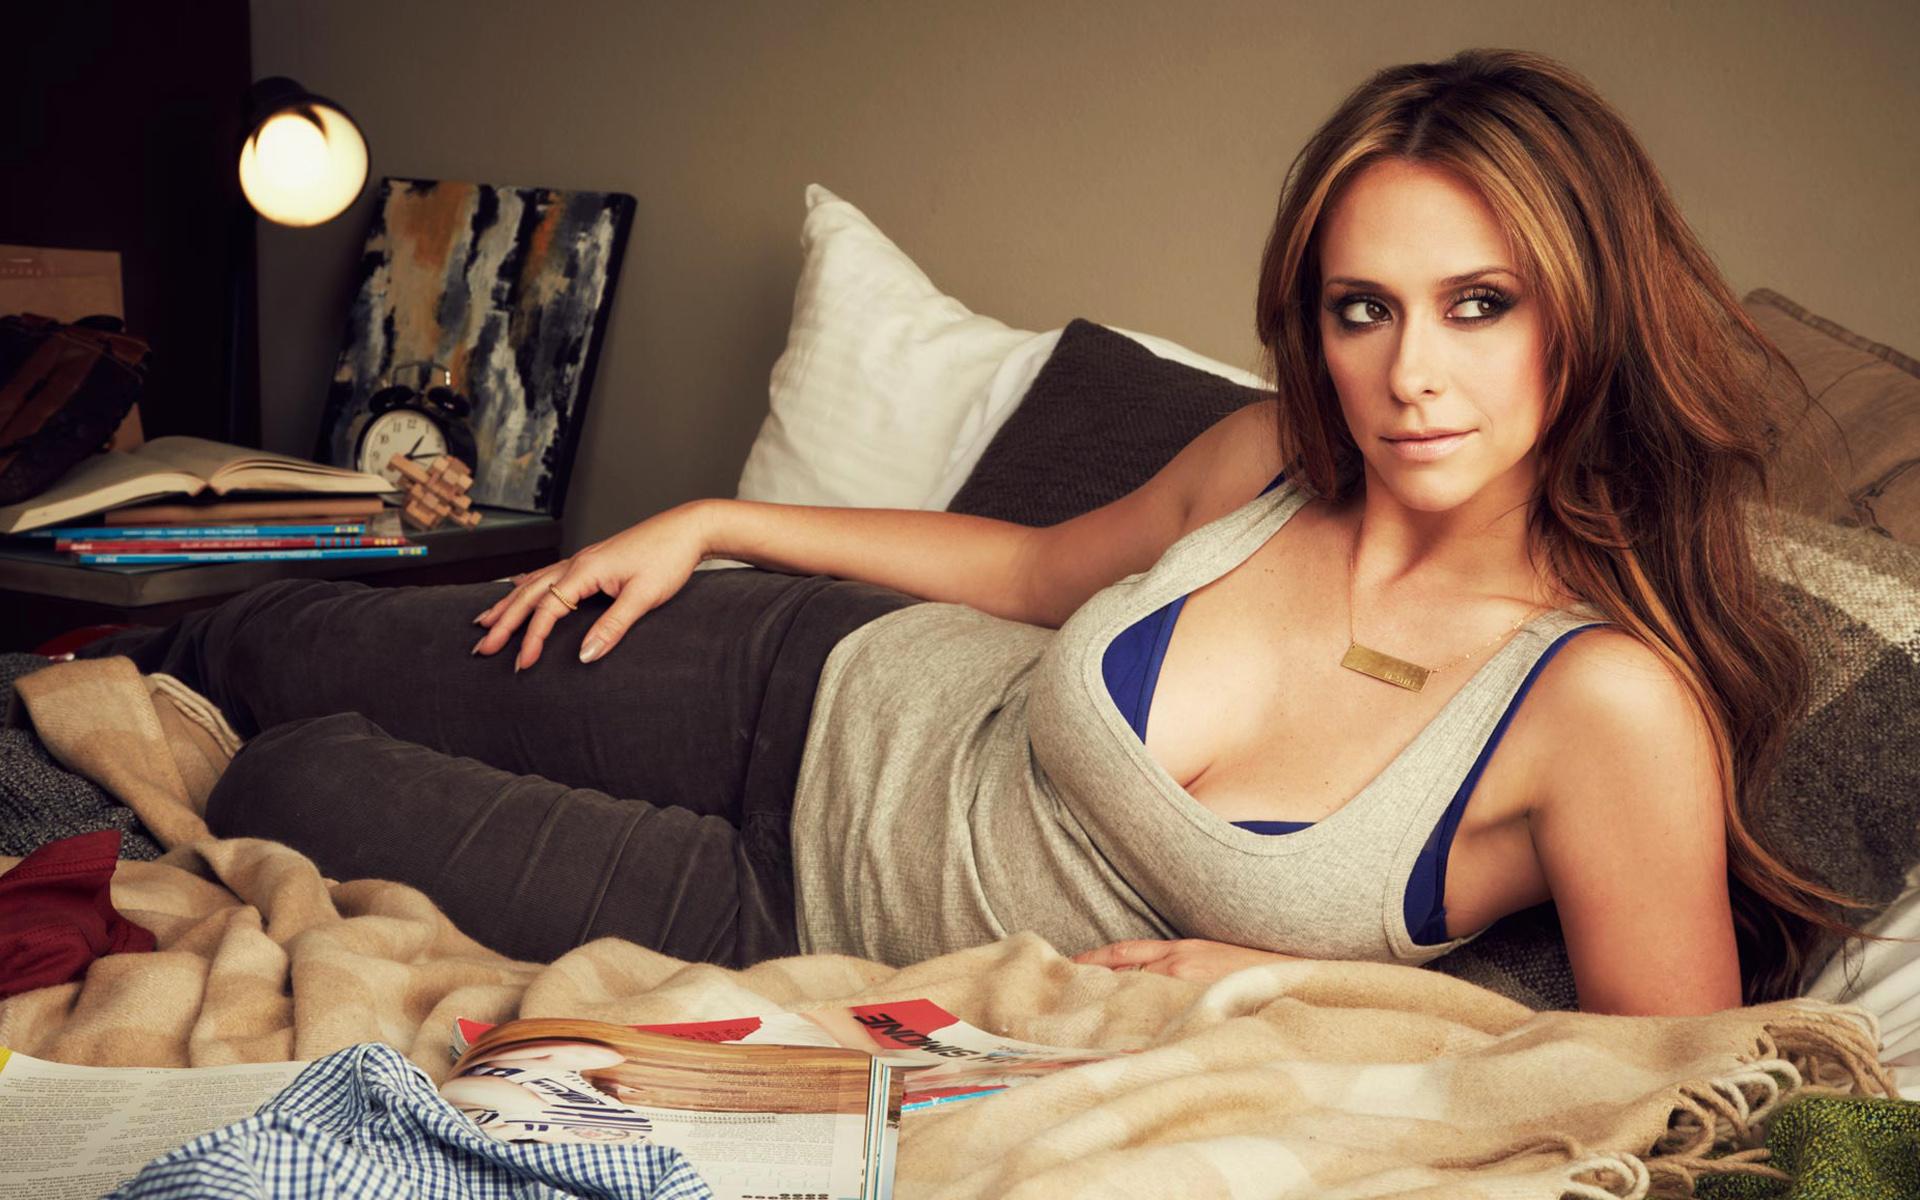 Jennifer Love Hewitt Wallpapers Wallpapers Hd